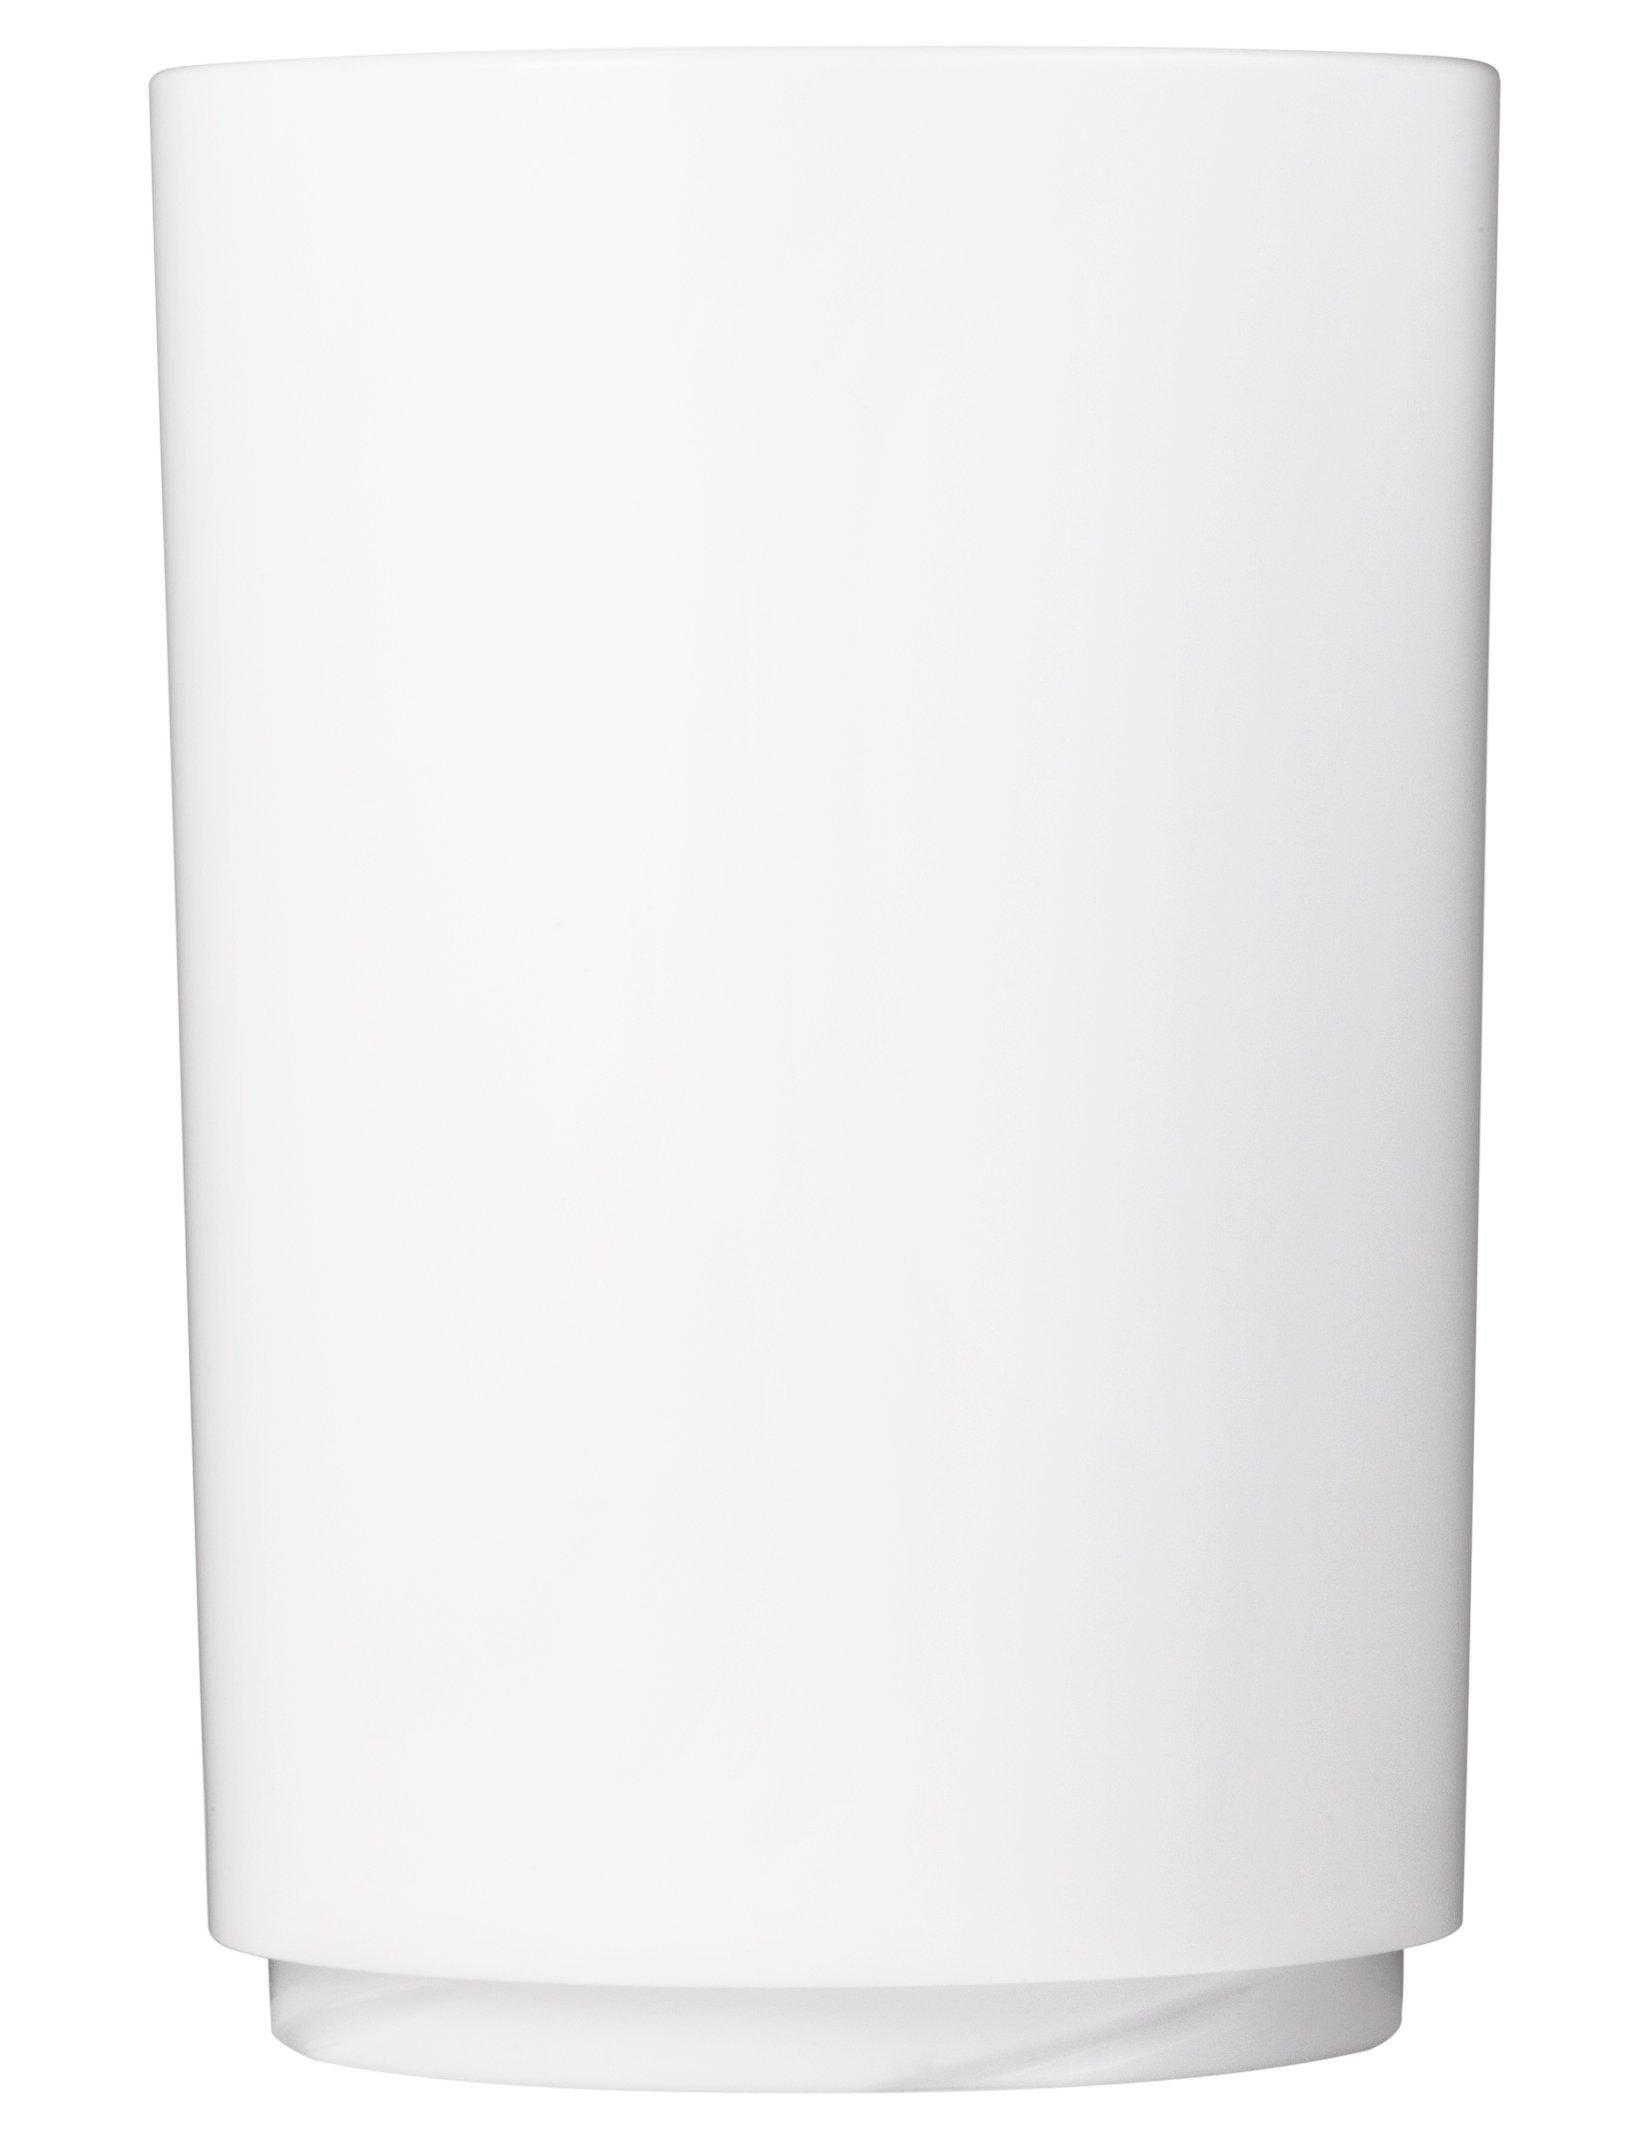 Drinique Elite Pint 16 oz. Tumbler   Case of 24 White   Unbreakable BPA-free Premium Tritan Plastic Drinking Glasses